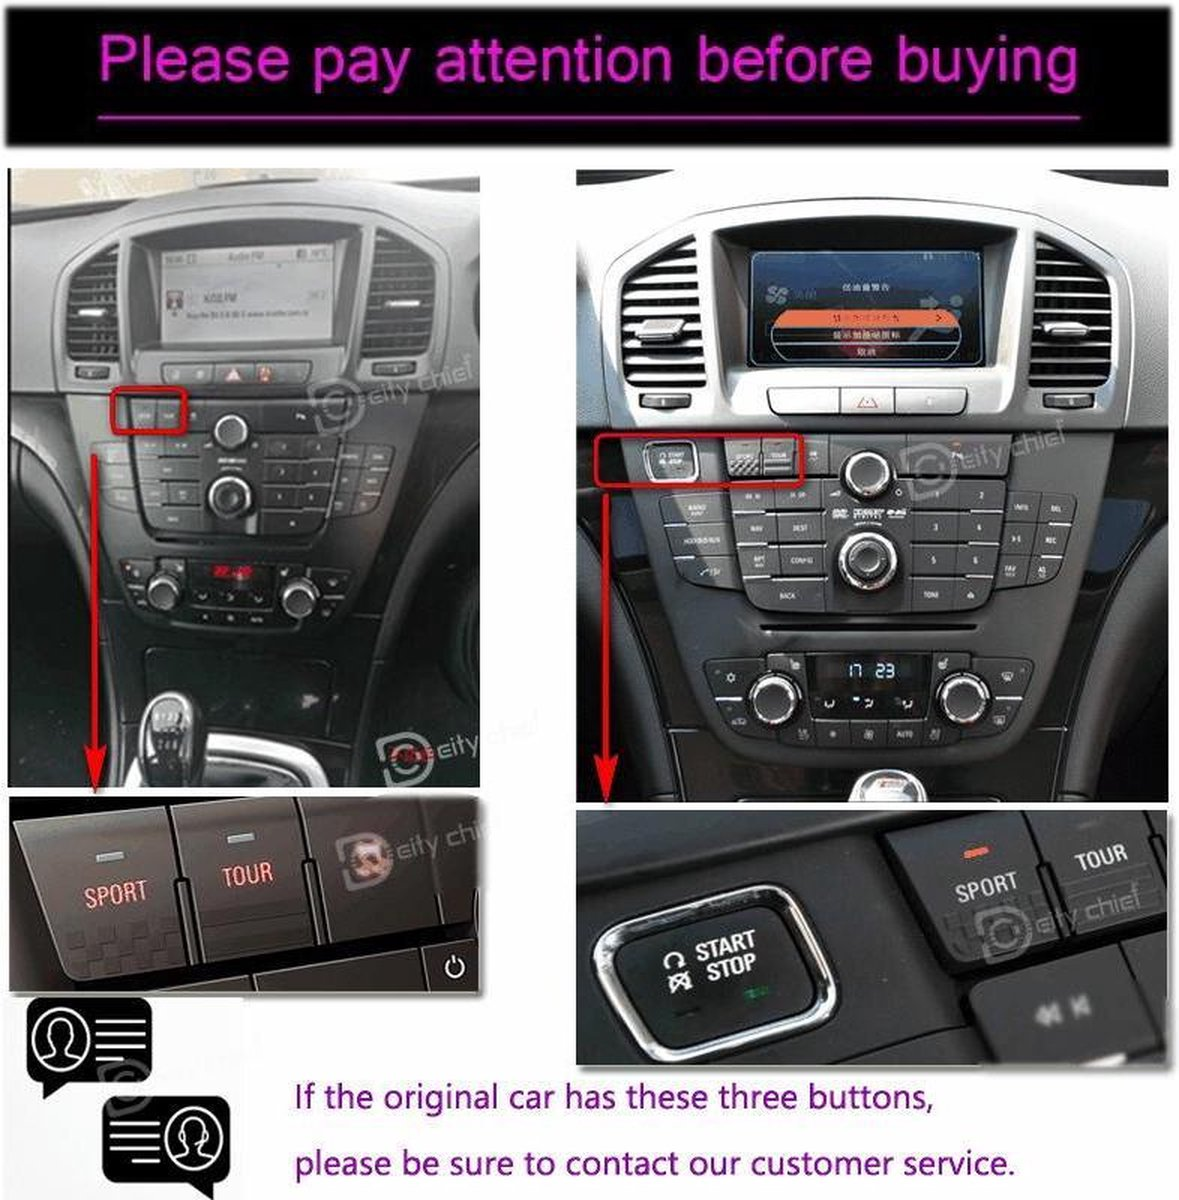 Opel Insignia 2008-2011 Android 9.0 navigatie en multimediasysteem 10,4 inch scherm 2+32GB Zwart